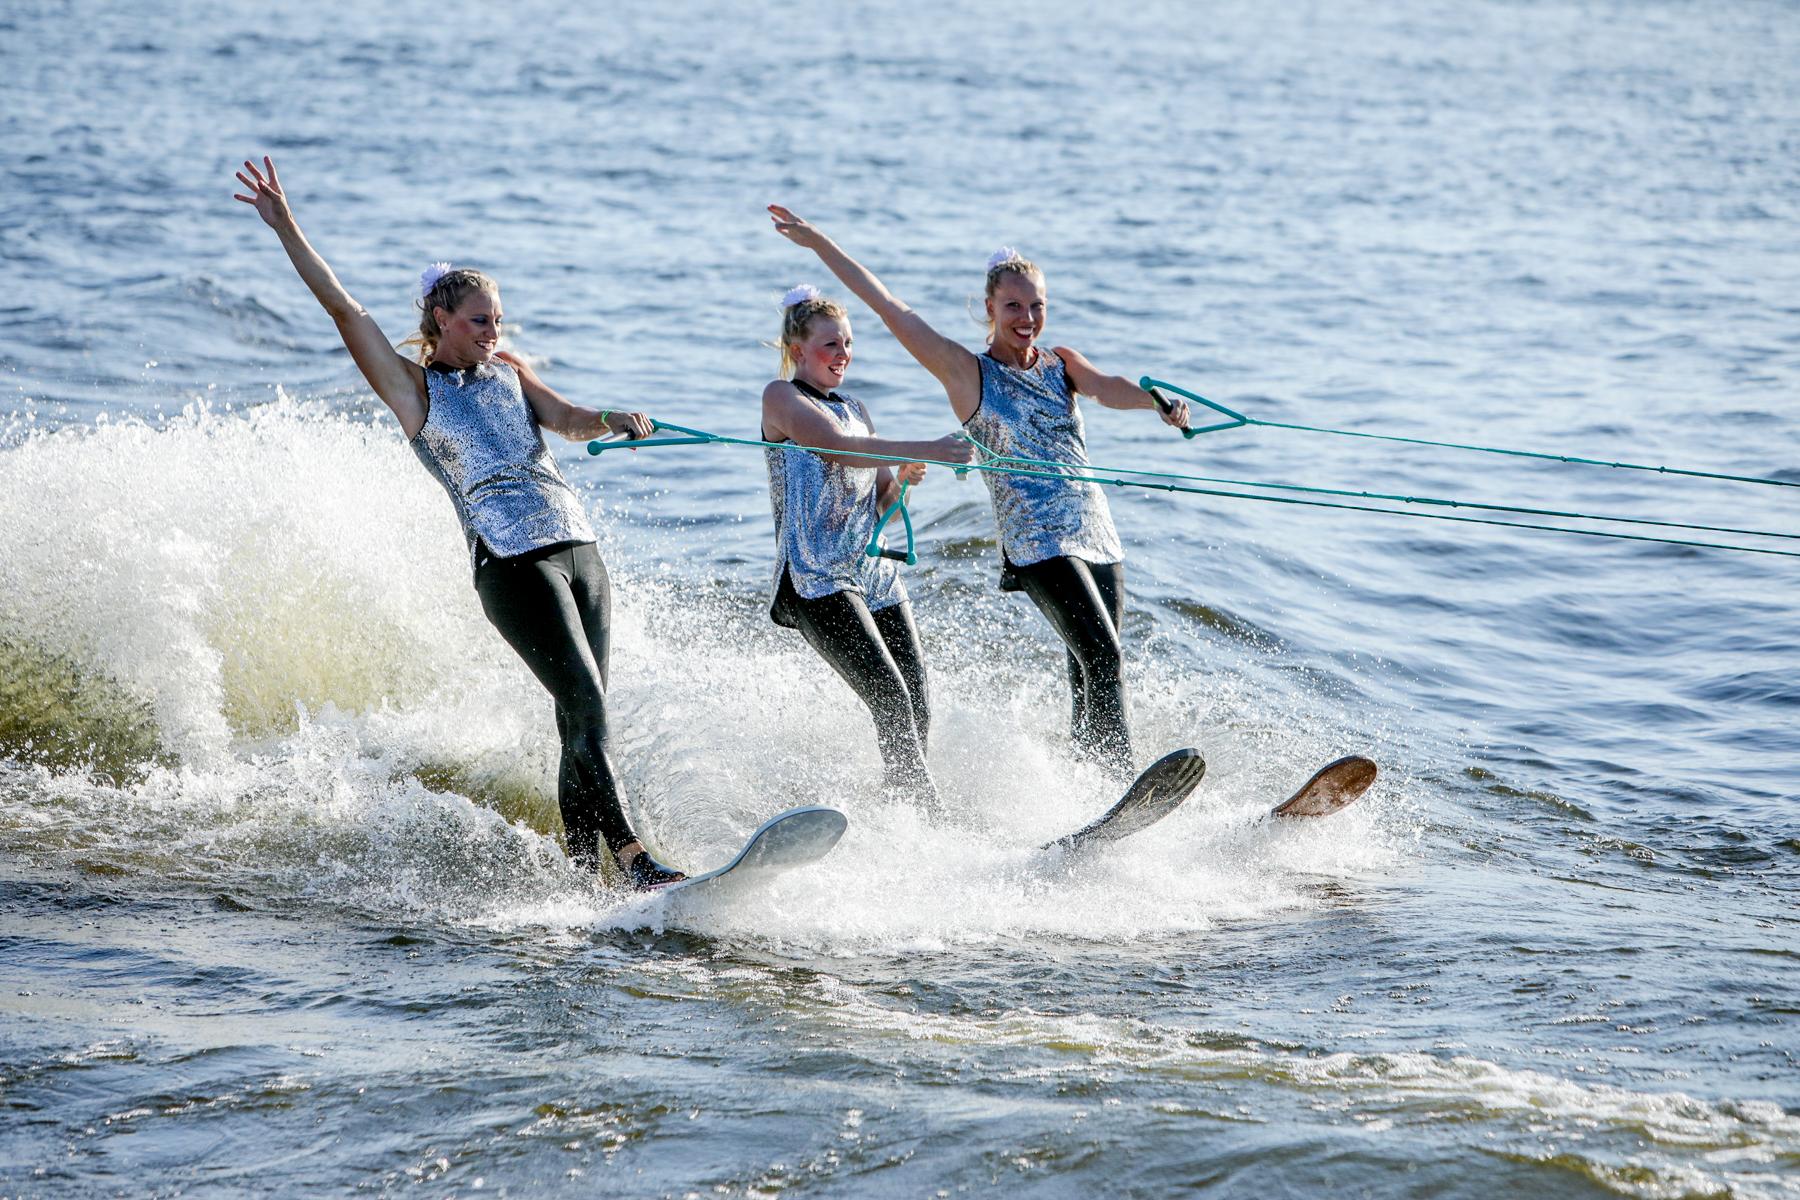 coast guard festival water skiing 2019